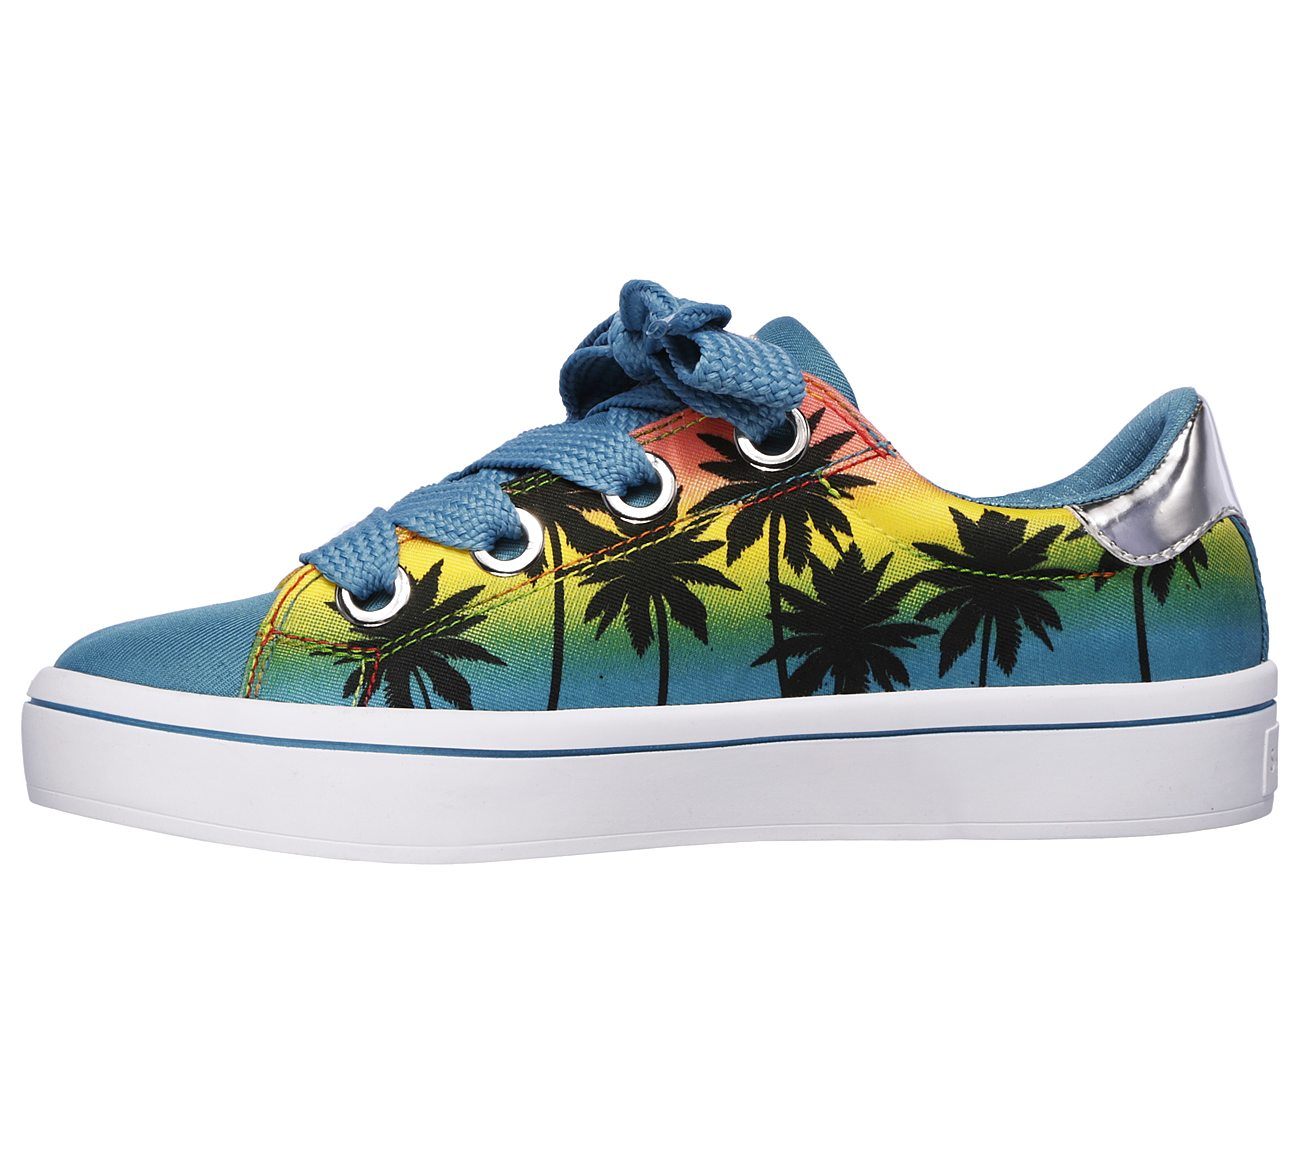 c6331c177 Buy SKECHERS Hi-Lites - By The Beach SKECHER Street Shoes only  30.00